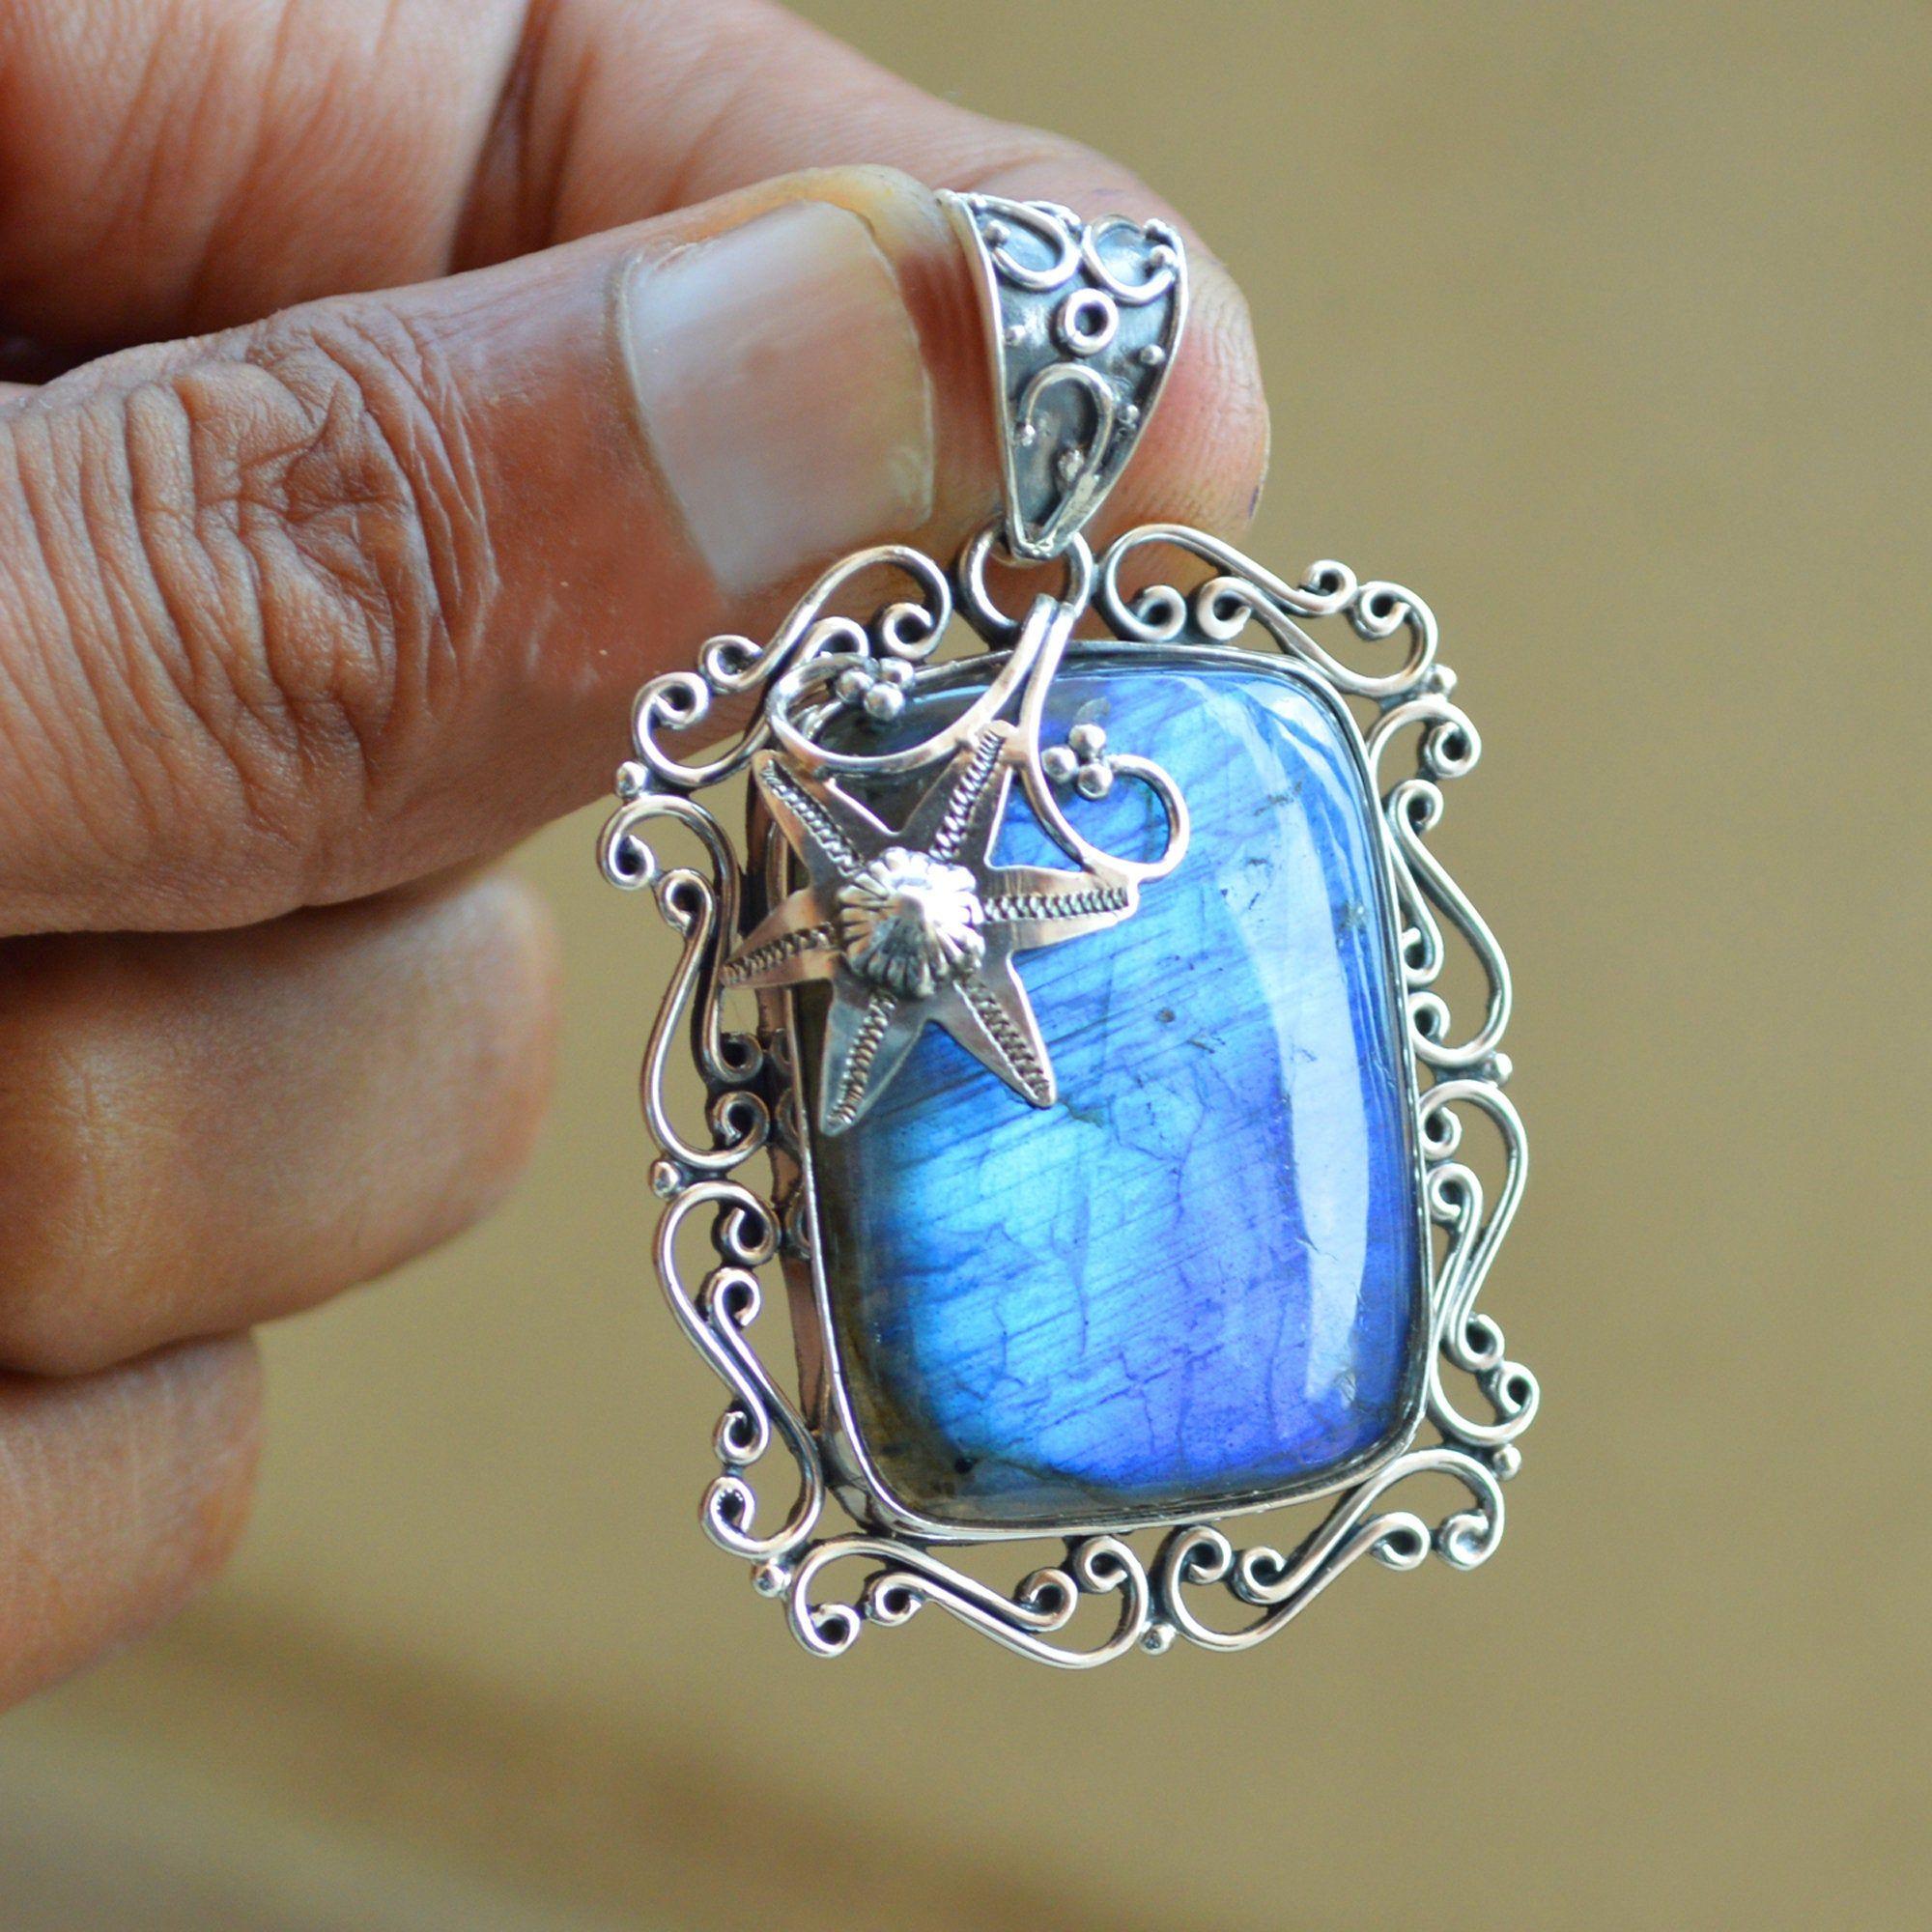 Natural Gemstone Pendant,Labradorite Necklace Blue Flash Labradorite Labradorite Necklace 925 Sterling Silver Silver Labradorite Necklace